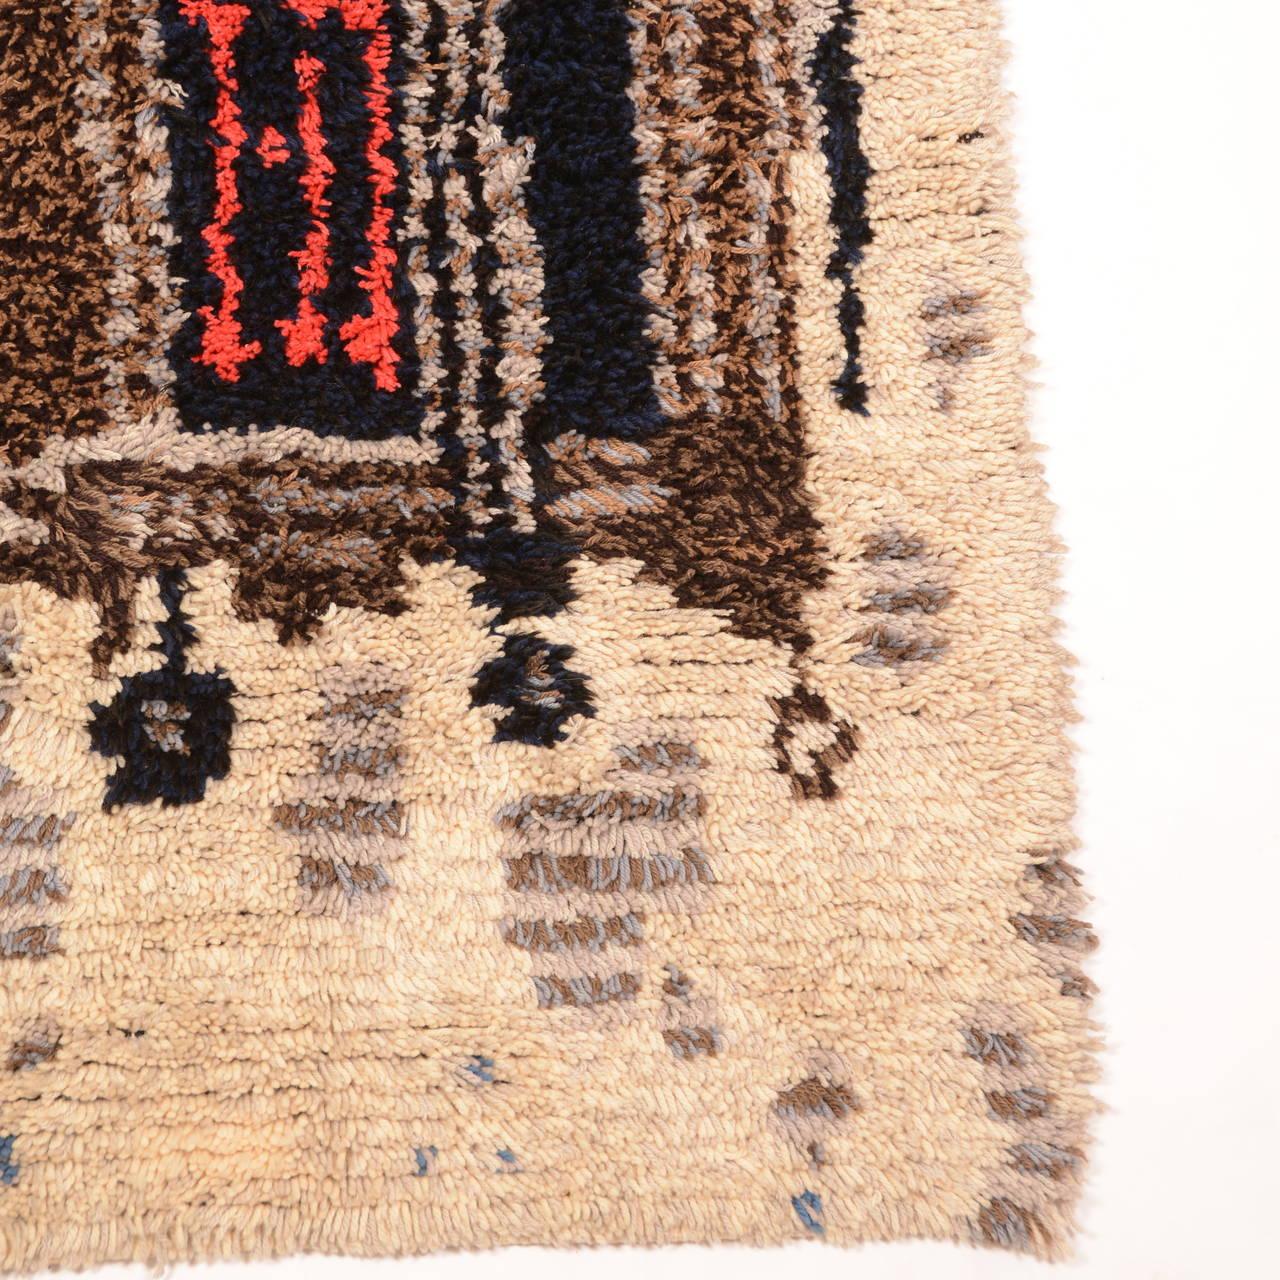 Modern Scandinavian Rug: Midcentury Scandinavian Modern Rya Wool Rug Wall Hanging